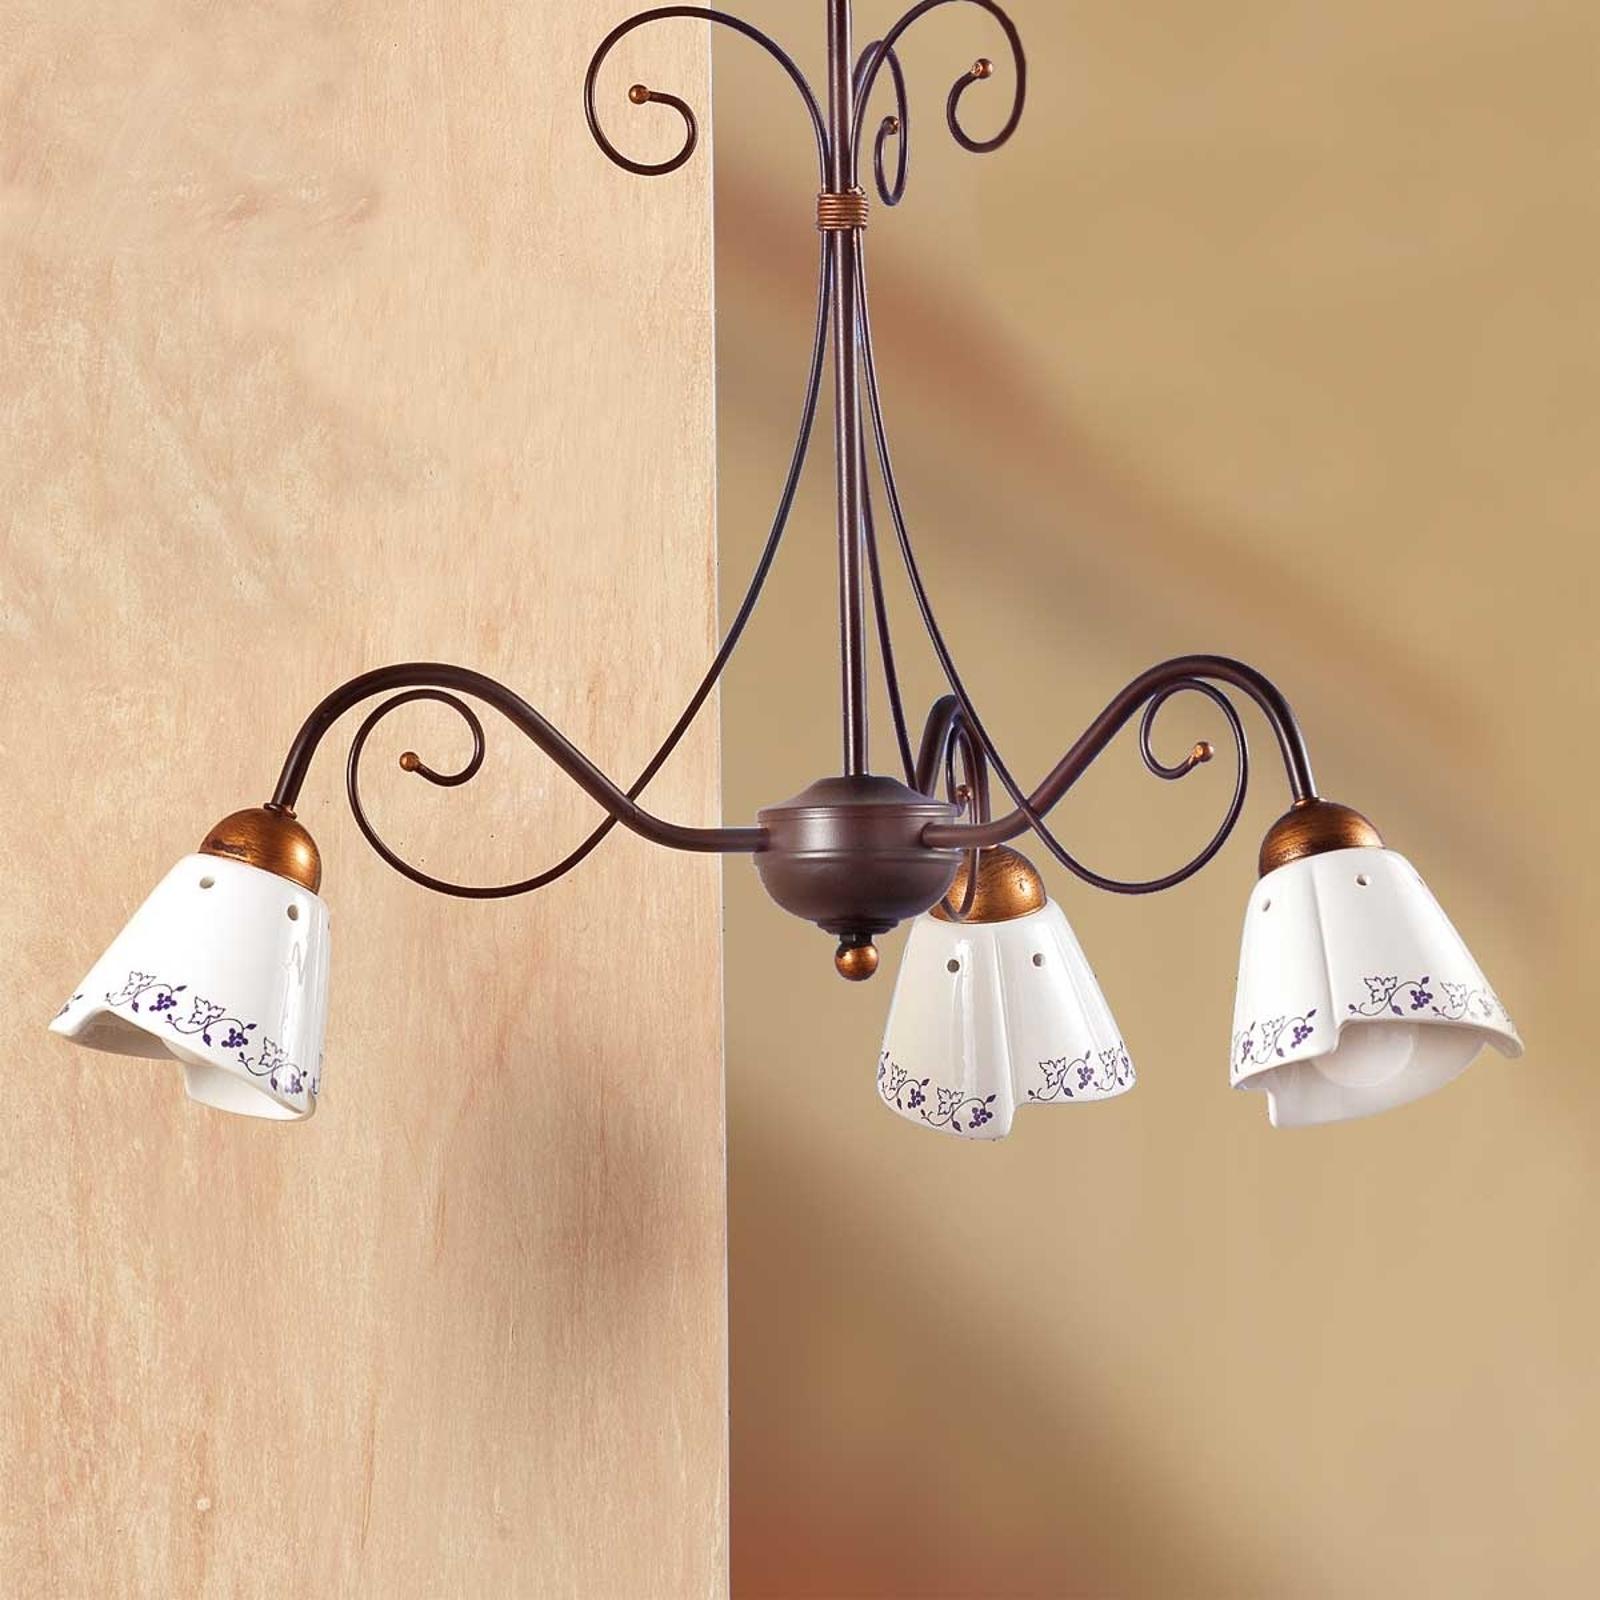 Classic CARTOCCIO hanging light, 3-bulb_2013039_1